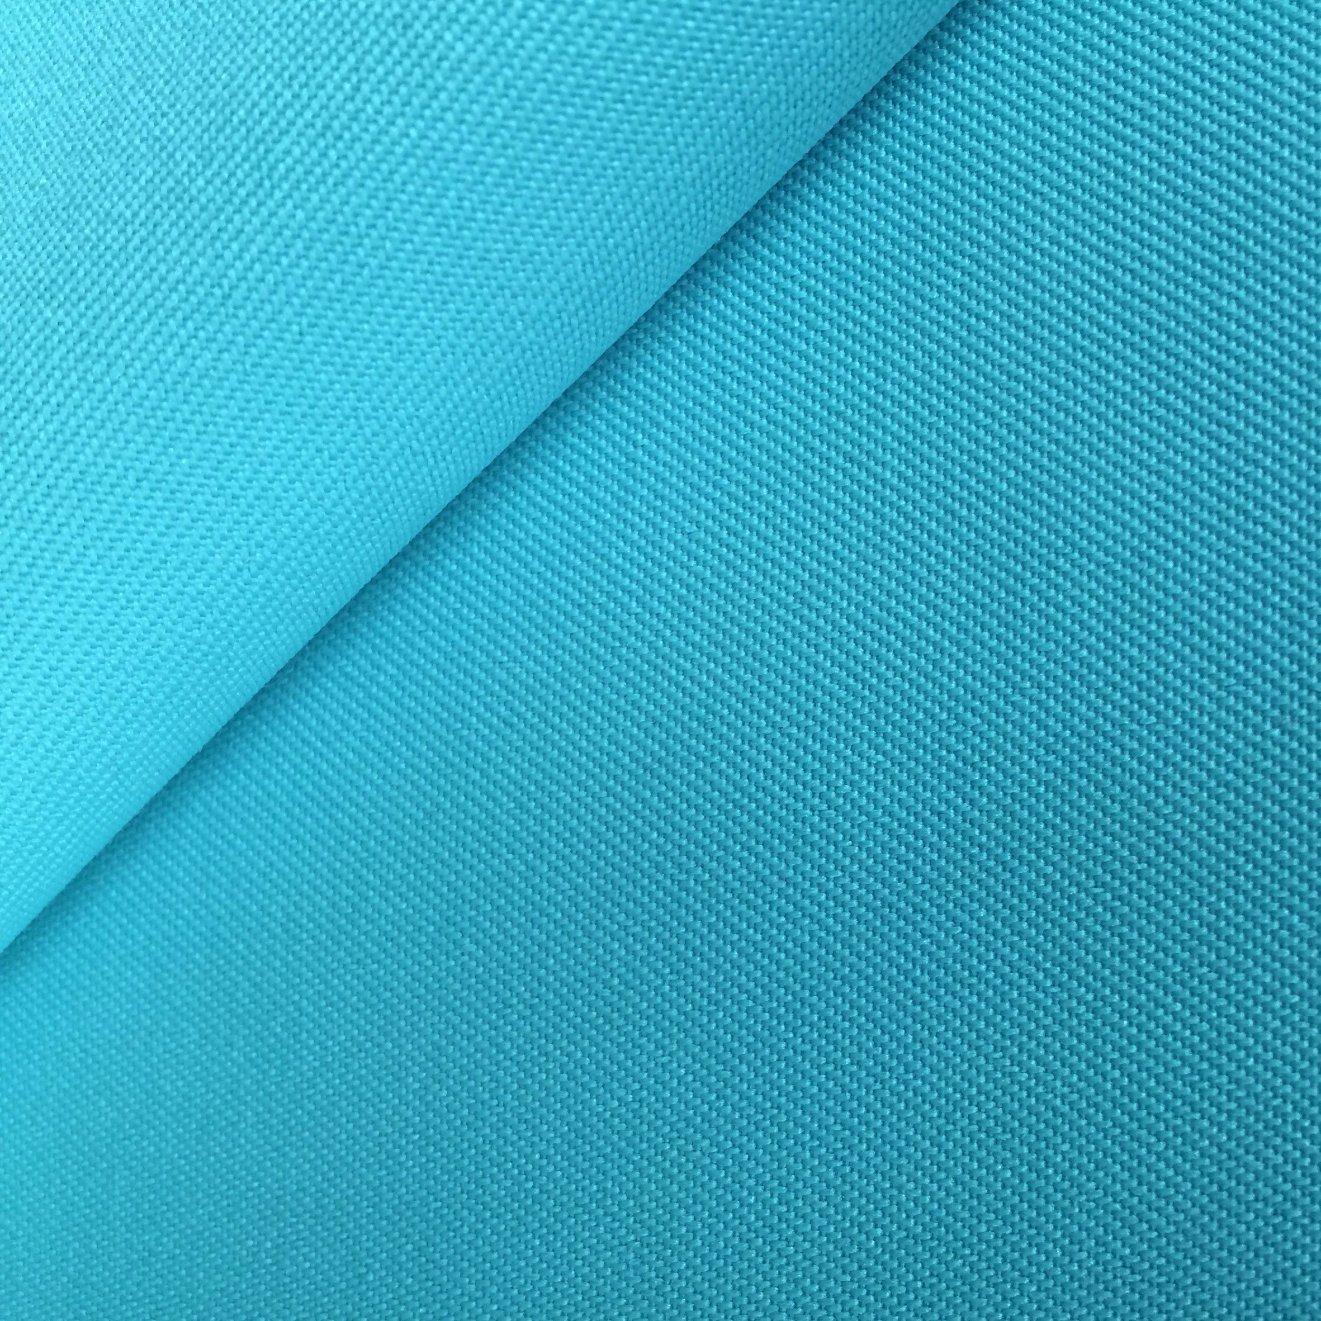 T/R 65/35 2/1 Twill Spandex 180GSM Training Clothing Uniform Fabric